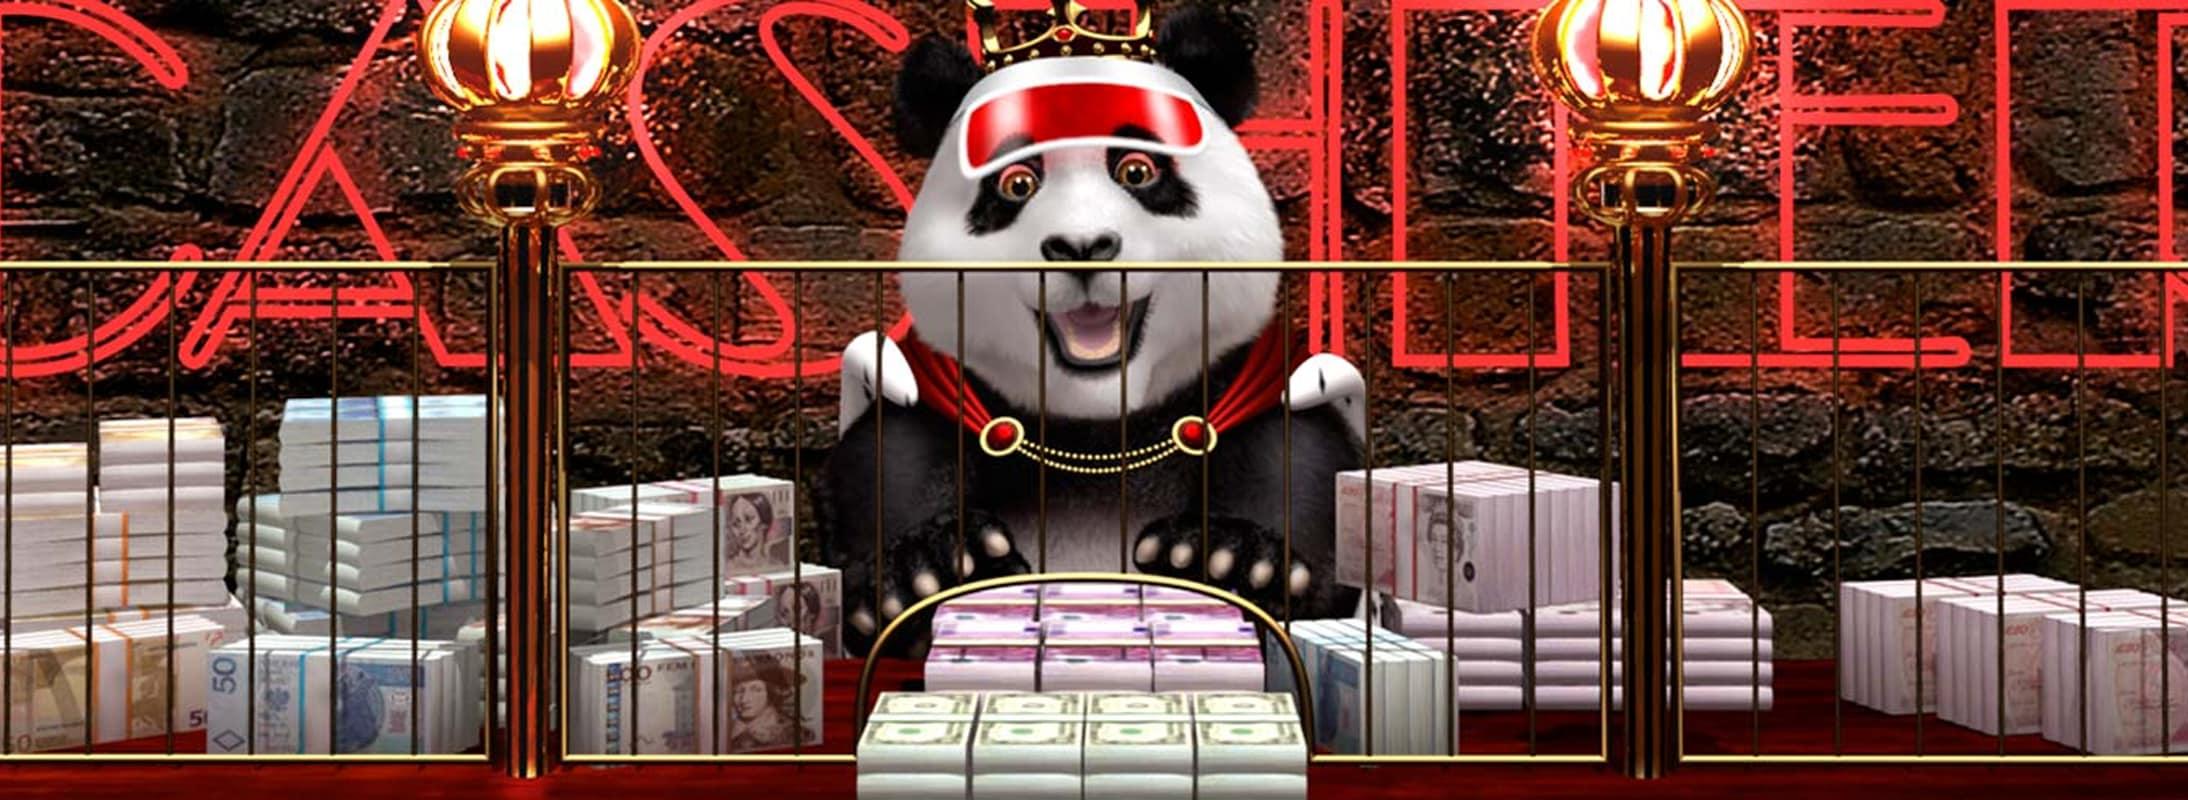 End of Summer Bonanza en hel uke hos Royal Panda Casino - Norway CasinoTop Banner 01